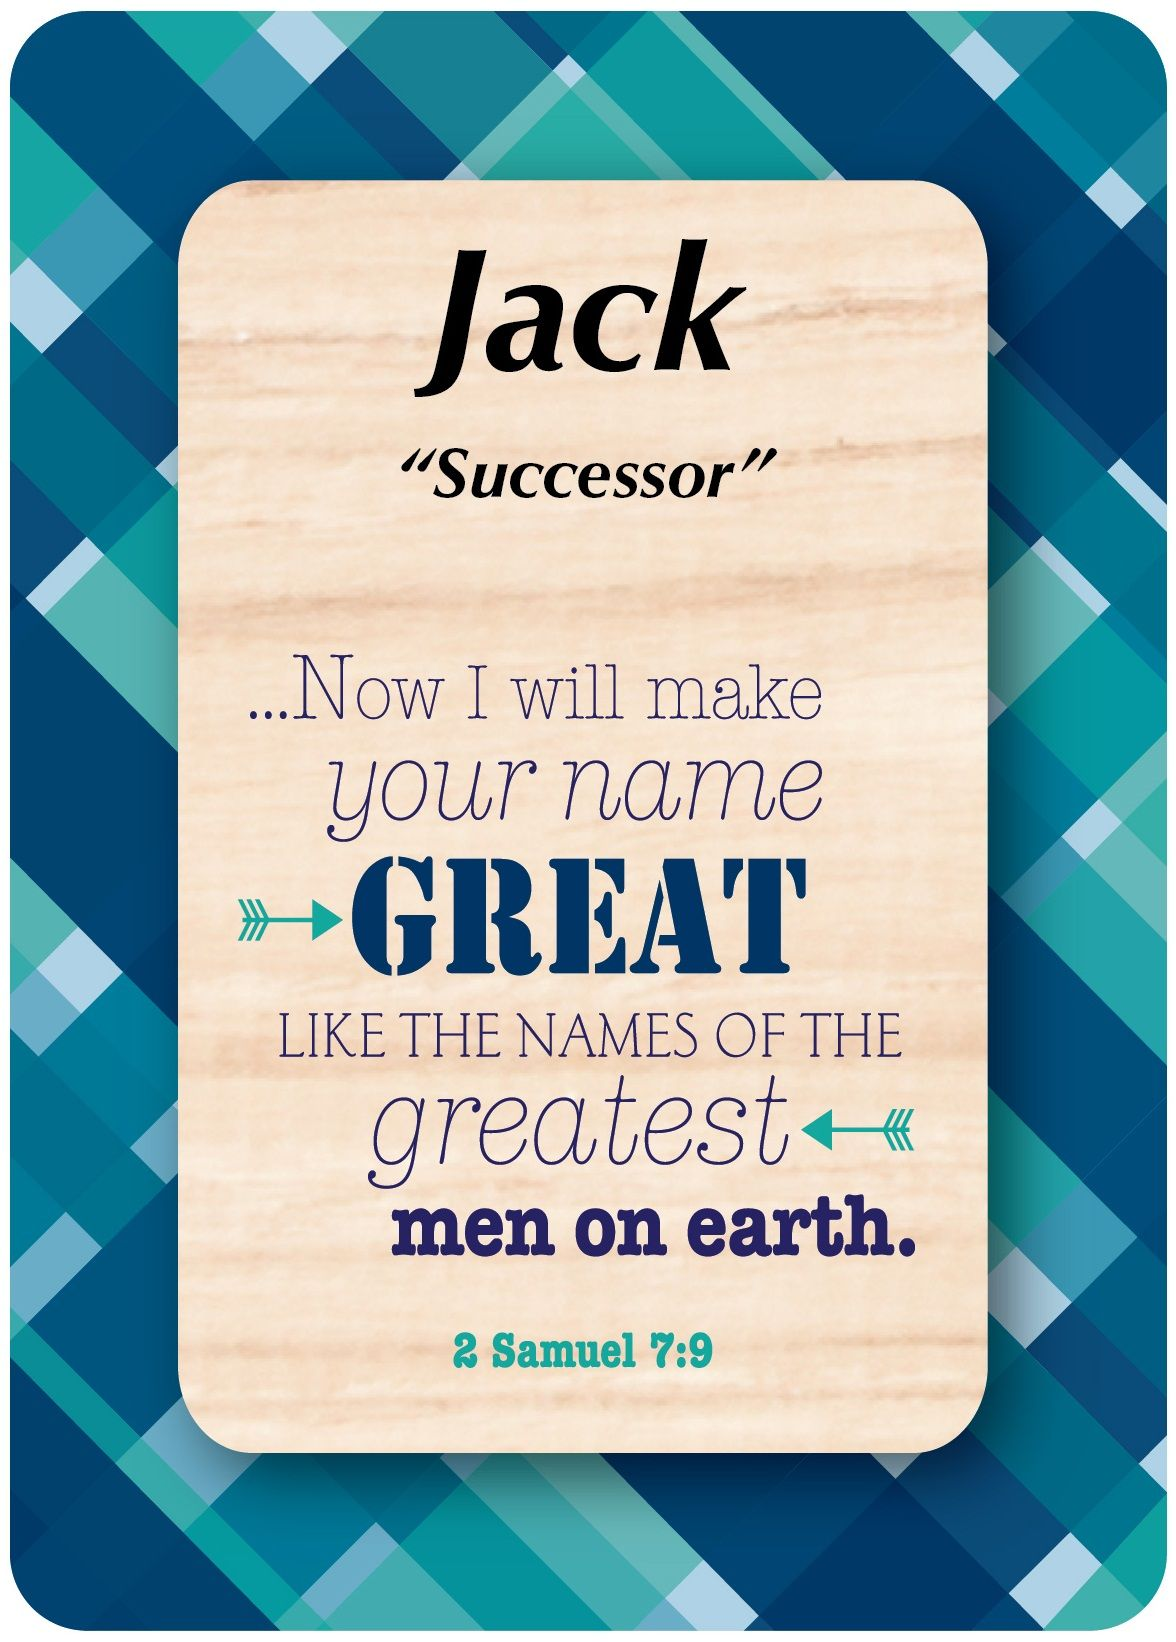 Jack means successor shown with 2 samuel 79